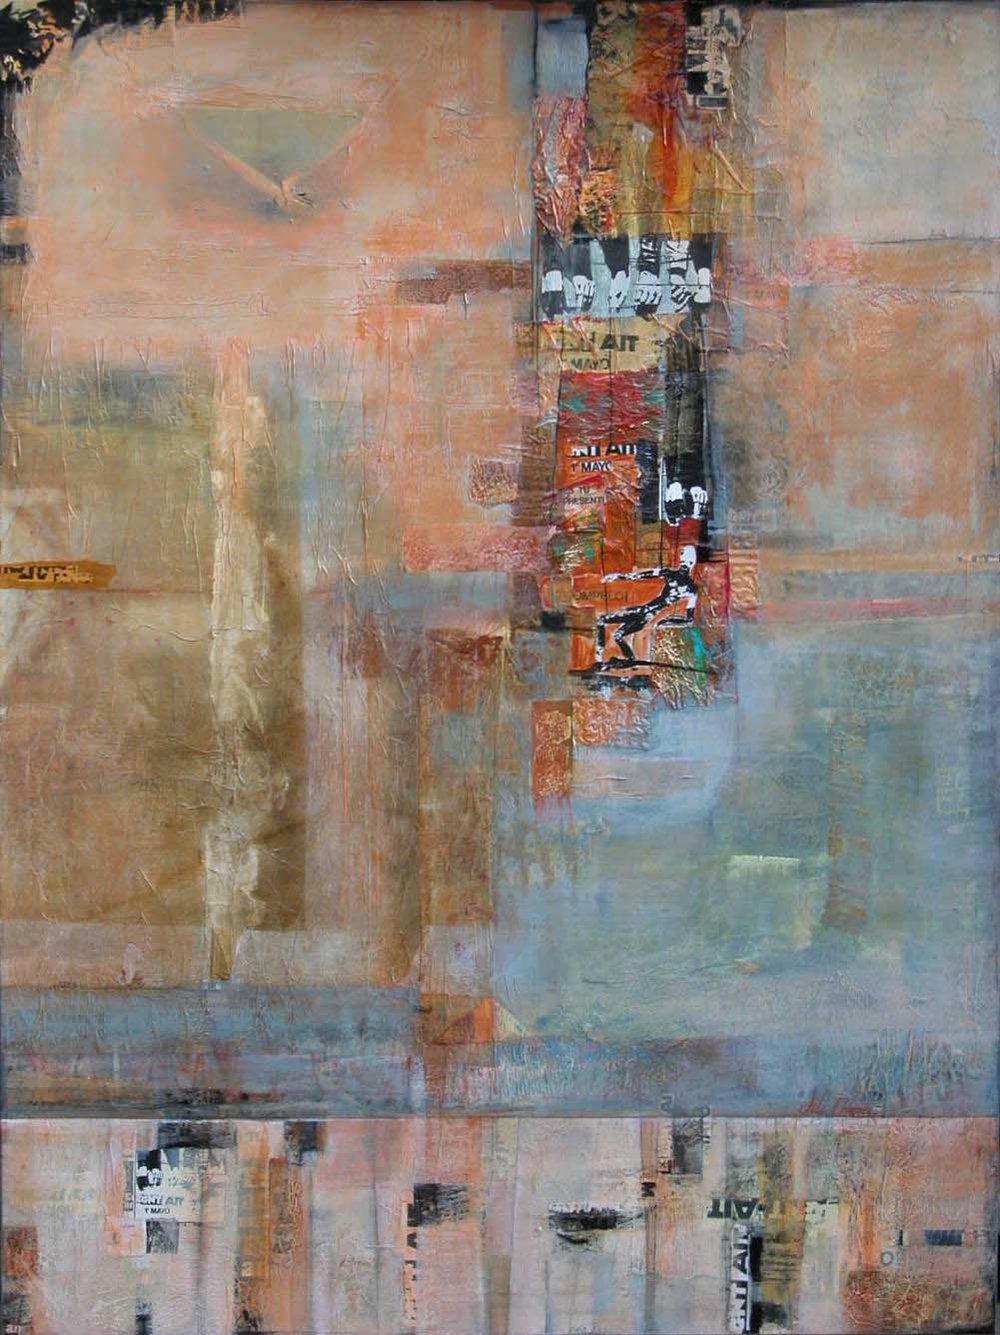 """Spanish Wall"" - Jill Ehlert ©48"" x 36"""